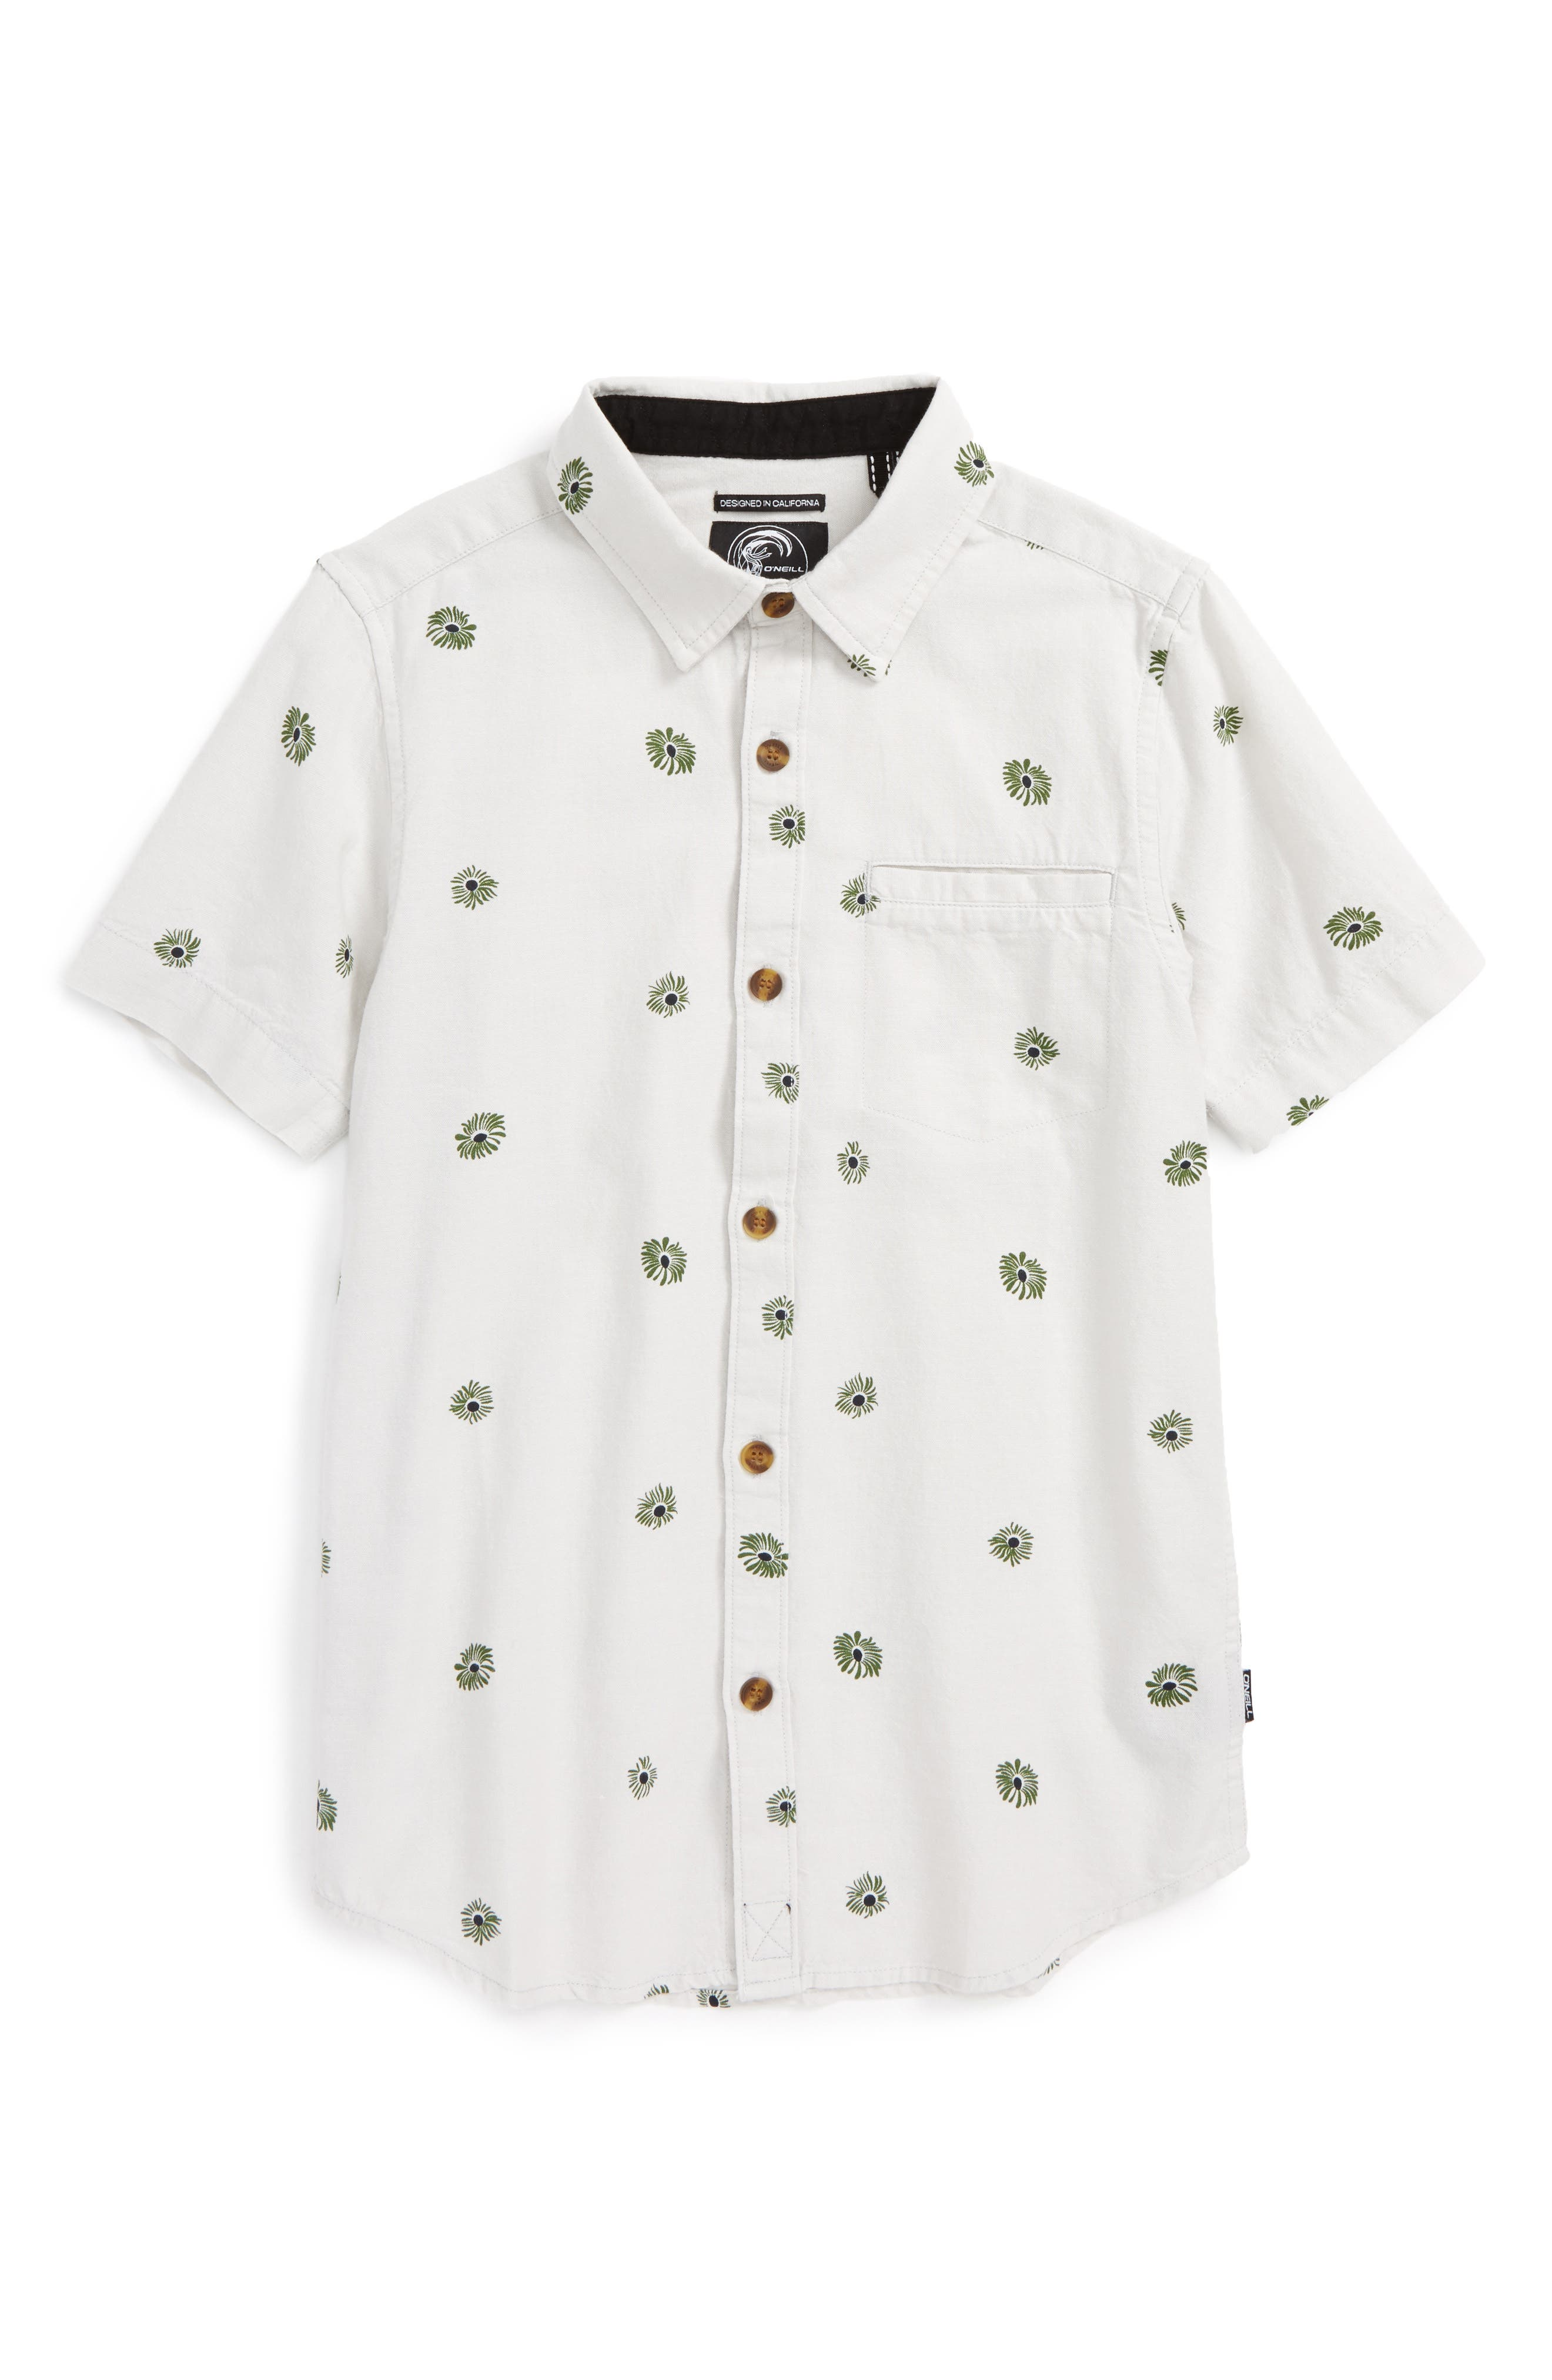 Brees Floral Print Woven Shirt,                             Main thumbnail 1, color,                             036